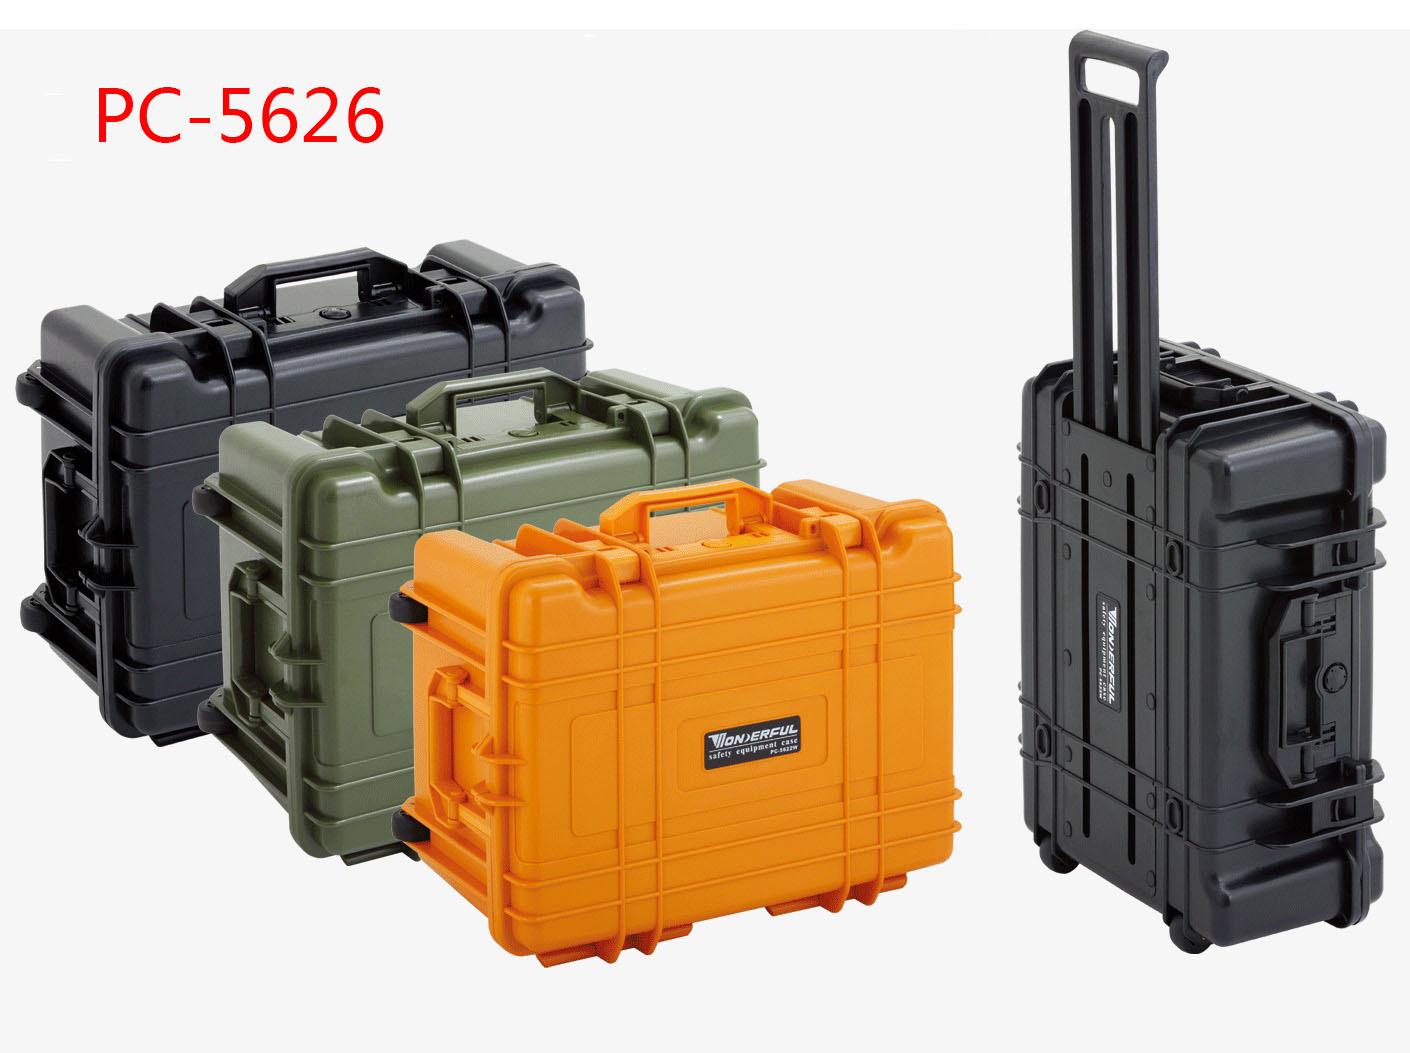 PC-5626带拉杆安全防护箱